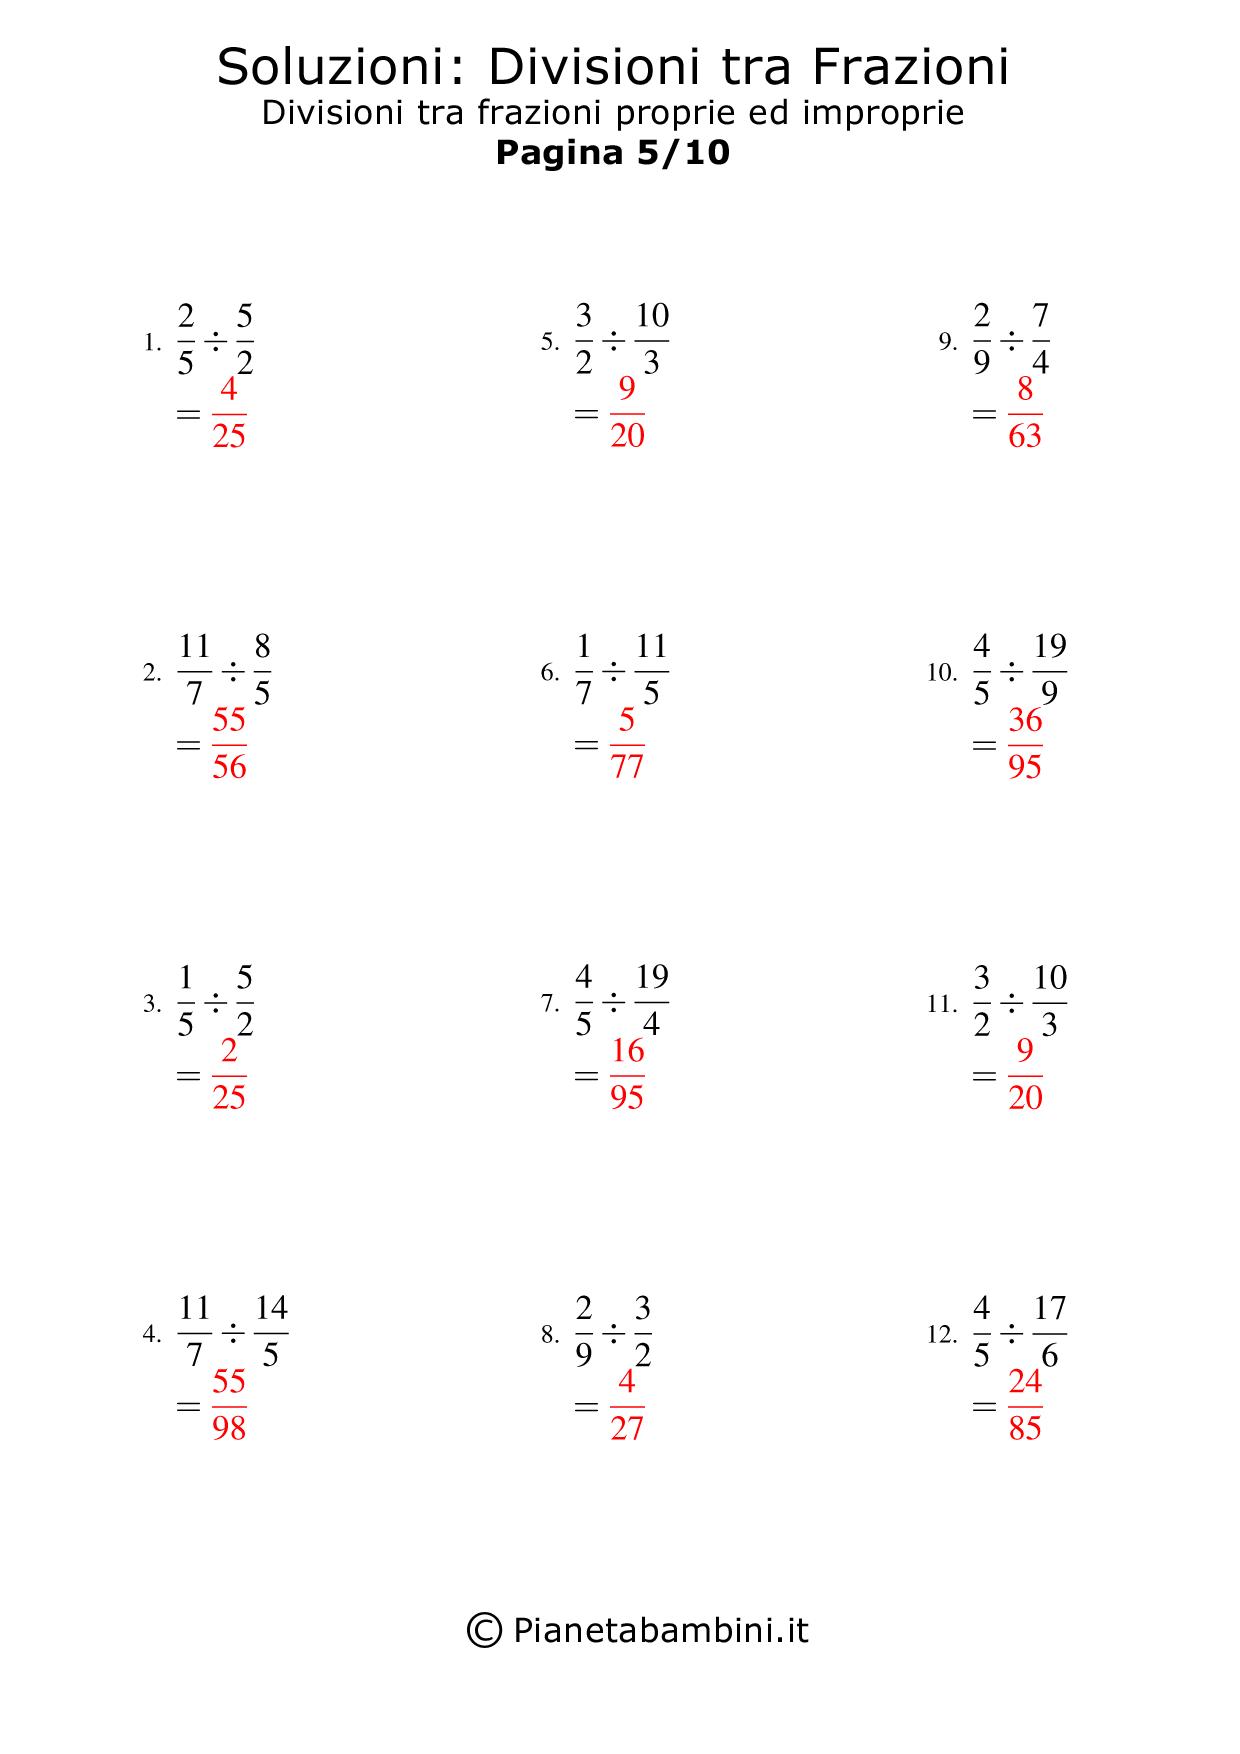 Soluzioni-Divisioni-Frazioni-Proprie-Improprie_05